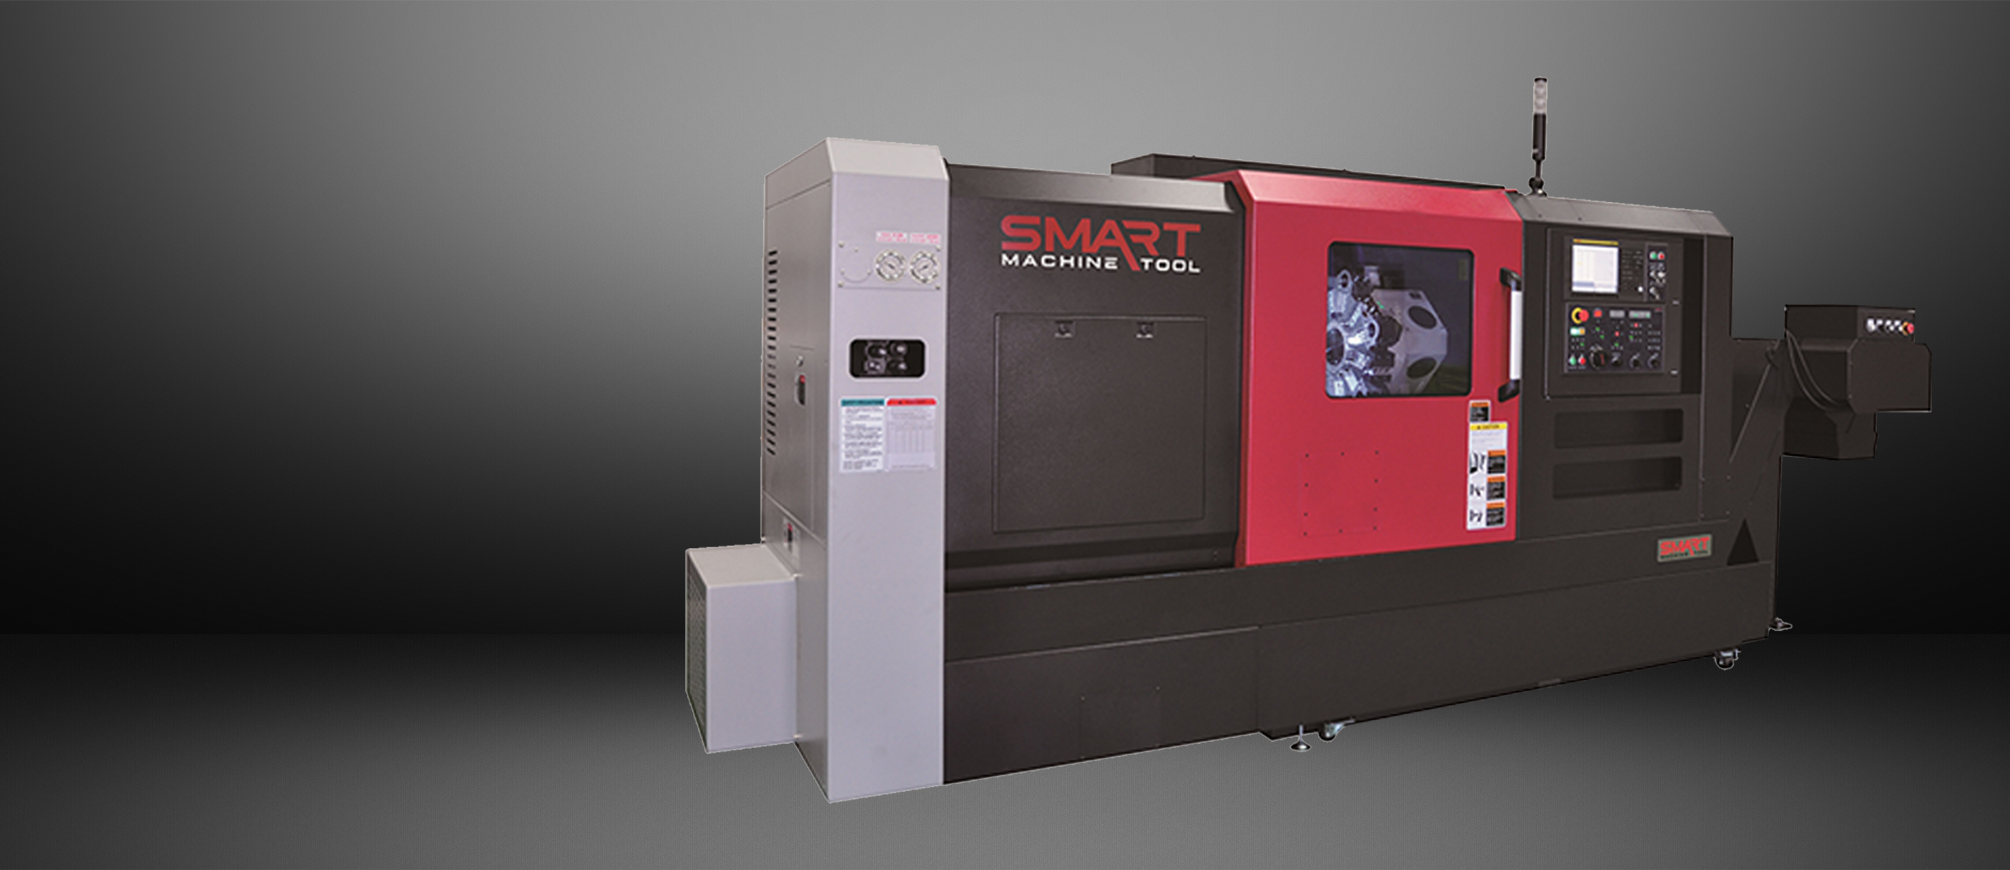 SMART NL 2000B – BOX WAY – (10″ CHUCK) 2-Axis CNC Lathes